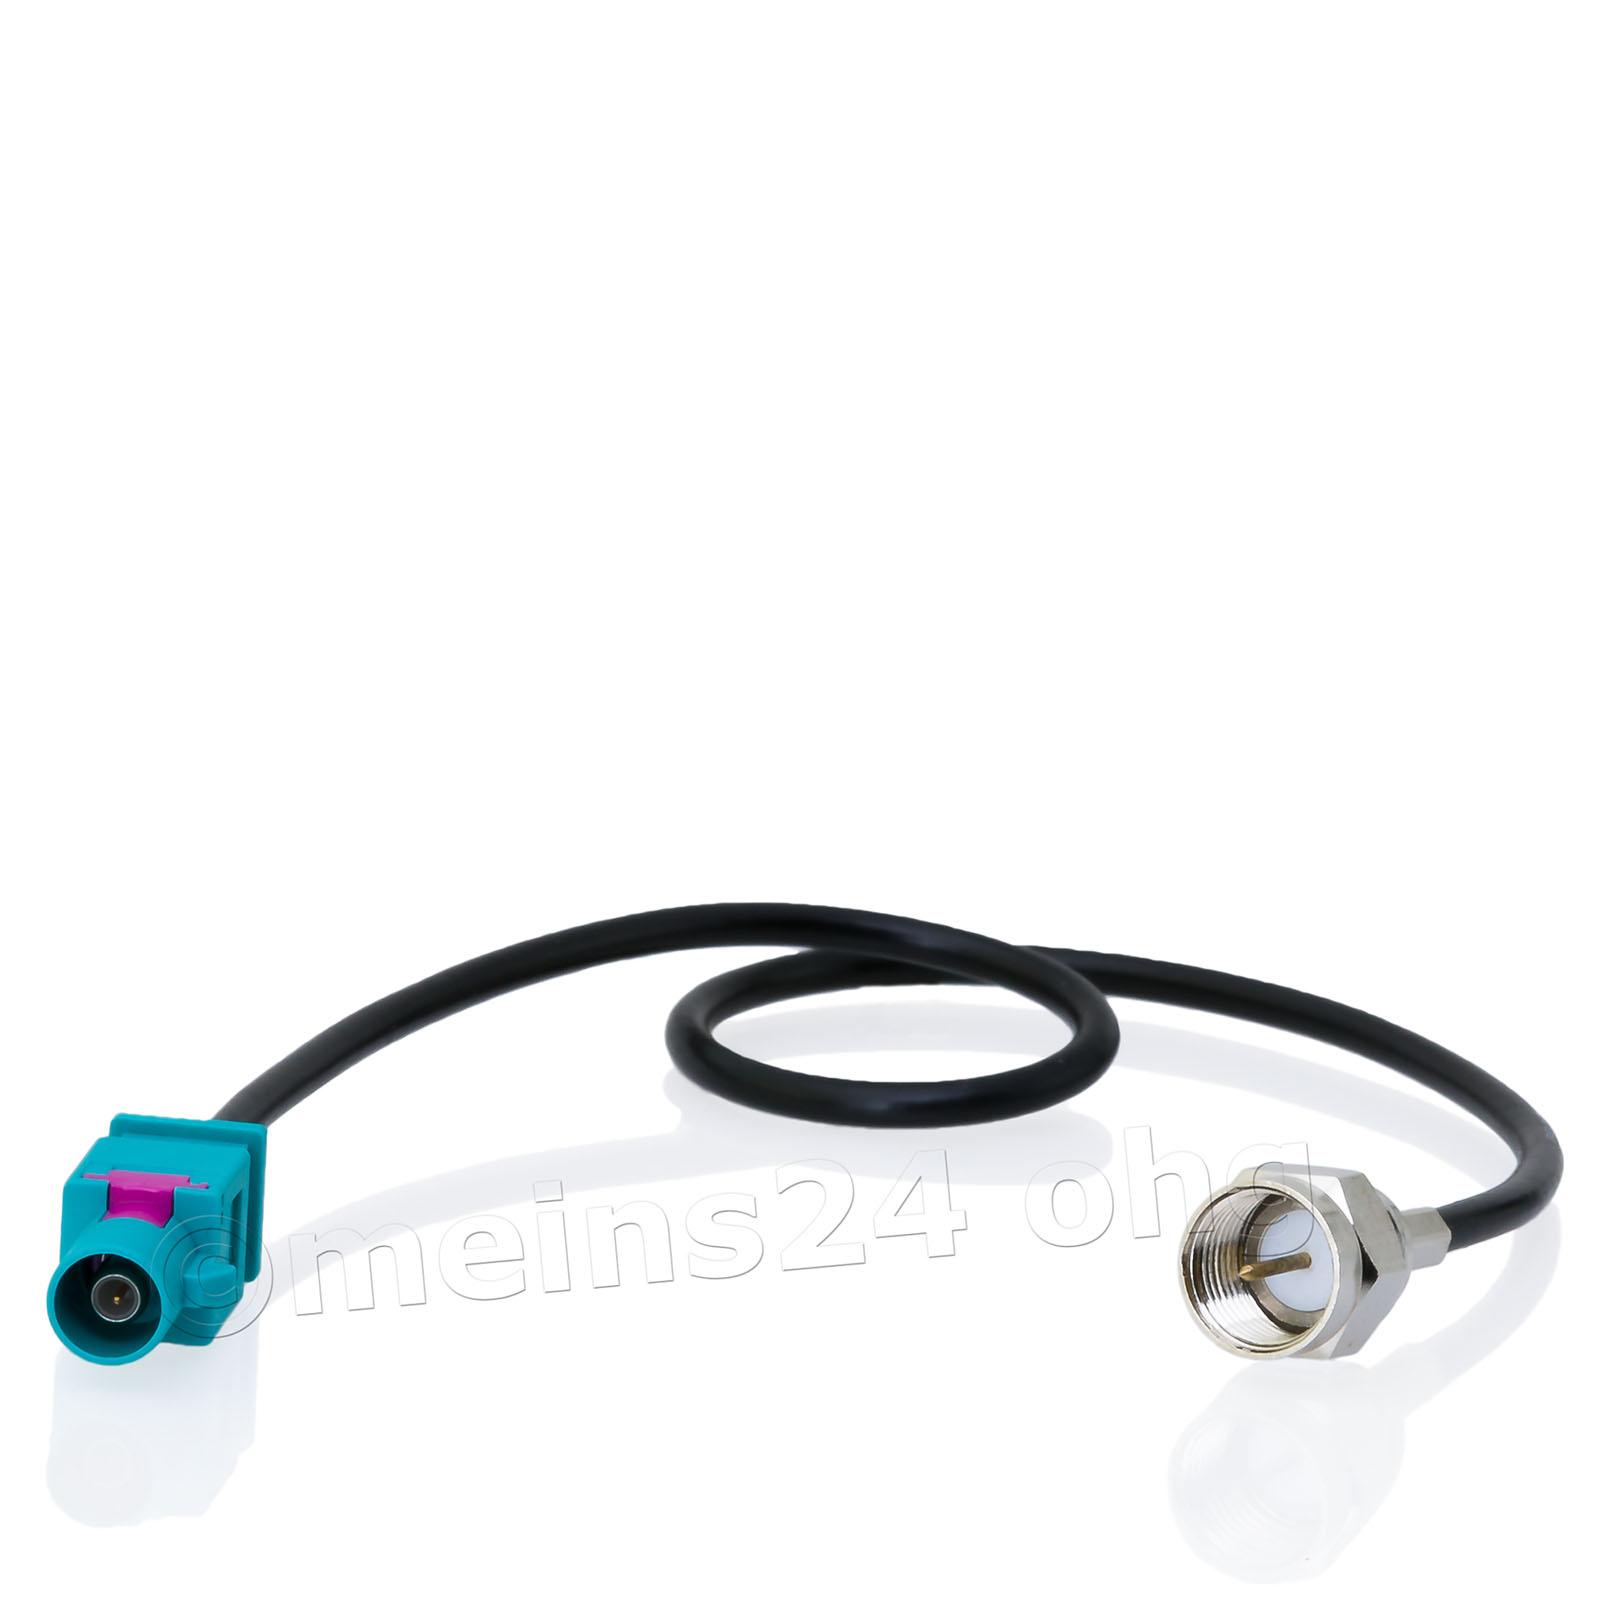 Antennenadapter Fakra Z Stecker (m) -> F Stecker (m)